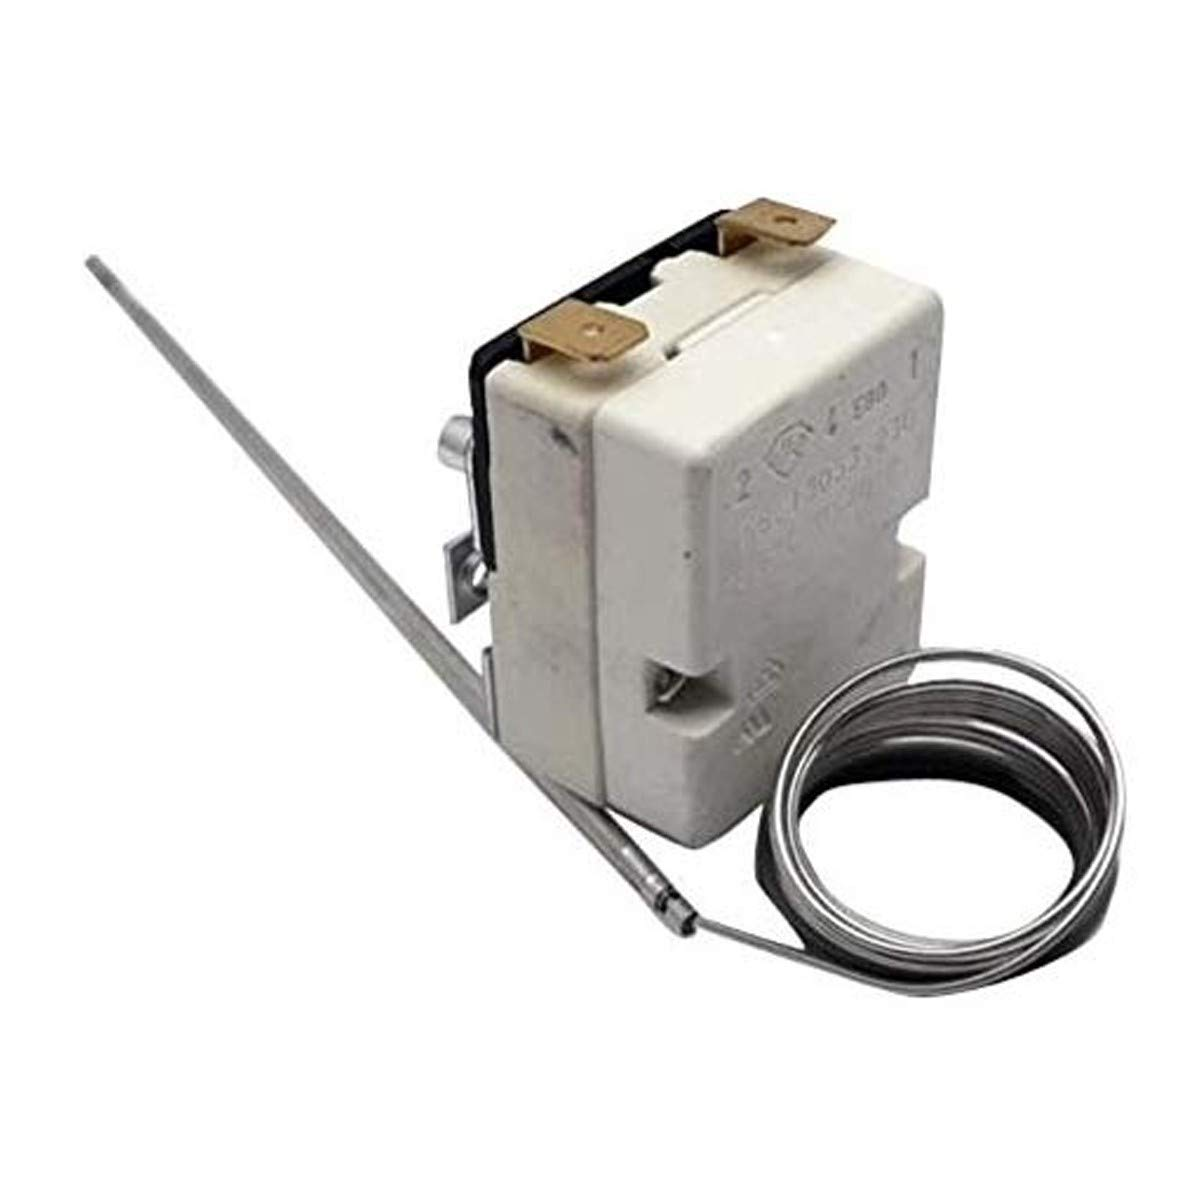 Recamania Termostato Regulable Horno Universal Temperatura 50 ...